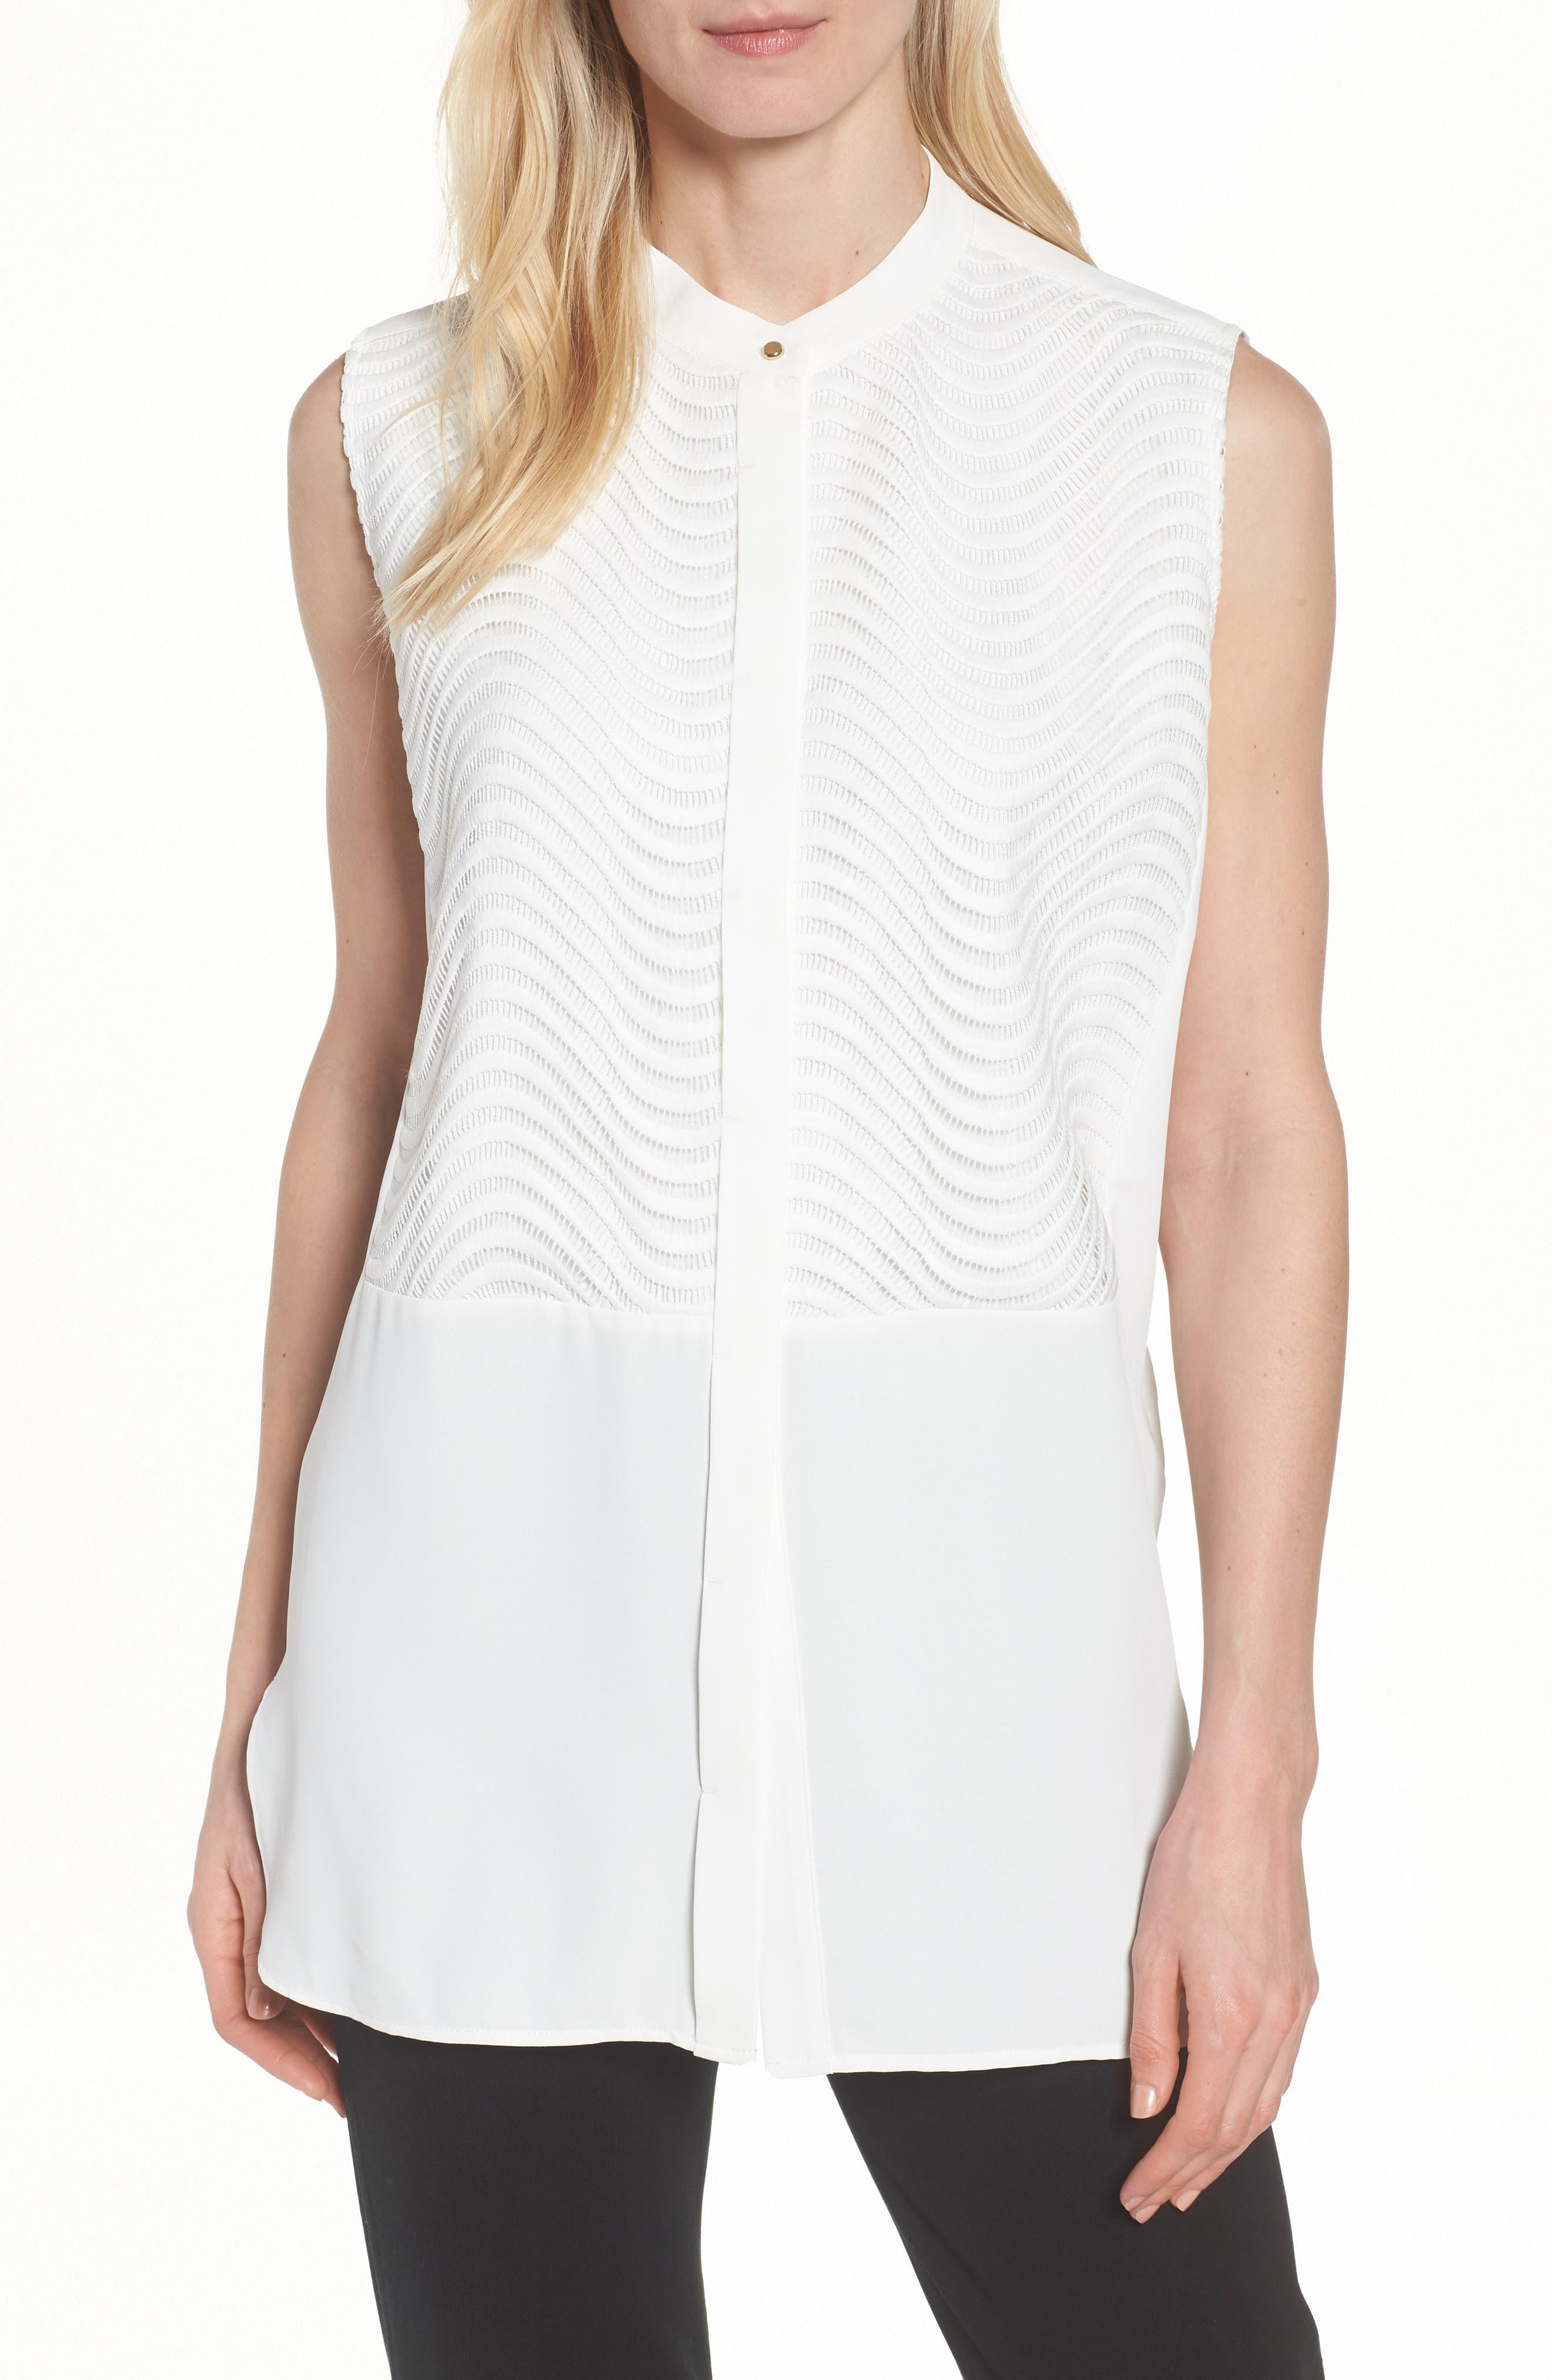 Tunic Blouse,                         Main,                         color, White